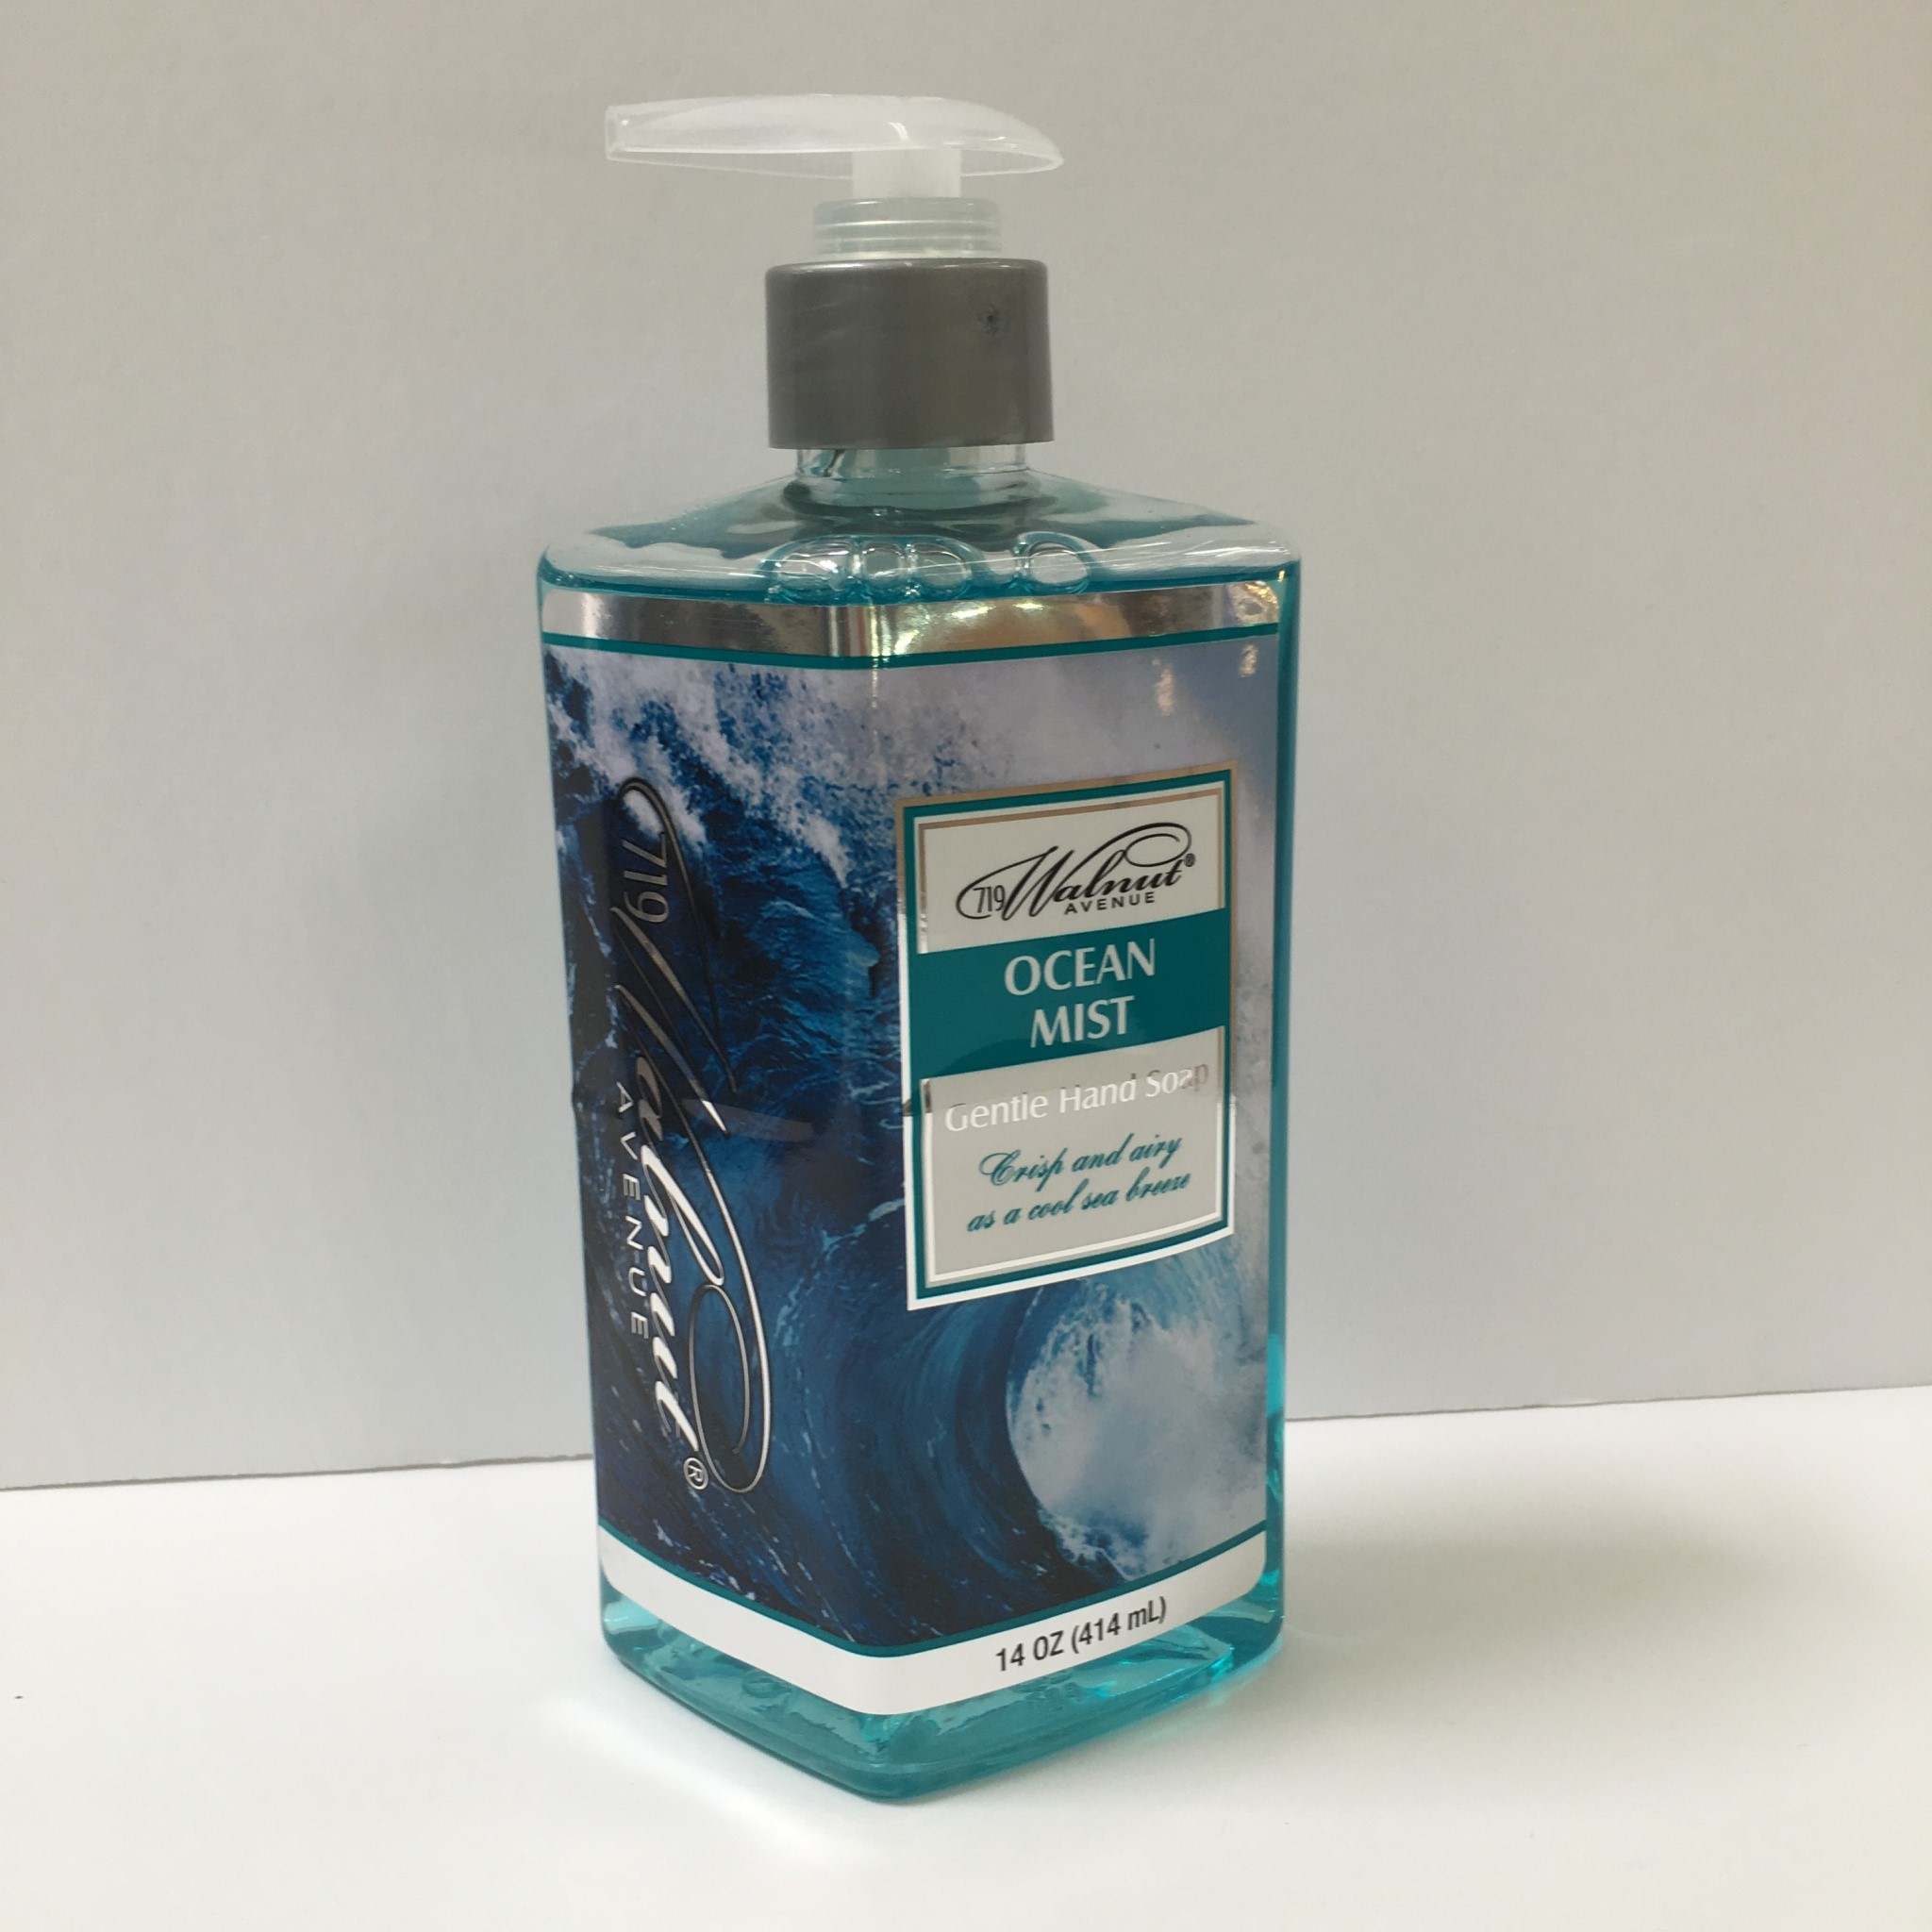 walmart kitchen appliances home depot cabinet refacing walnut avenue 719 liquid hand soap, ocean mist, 14 fl oz ...